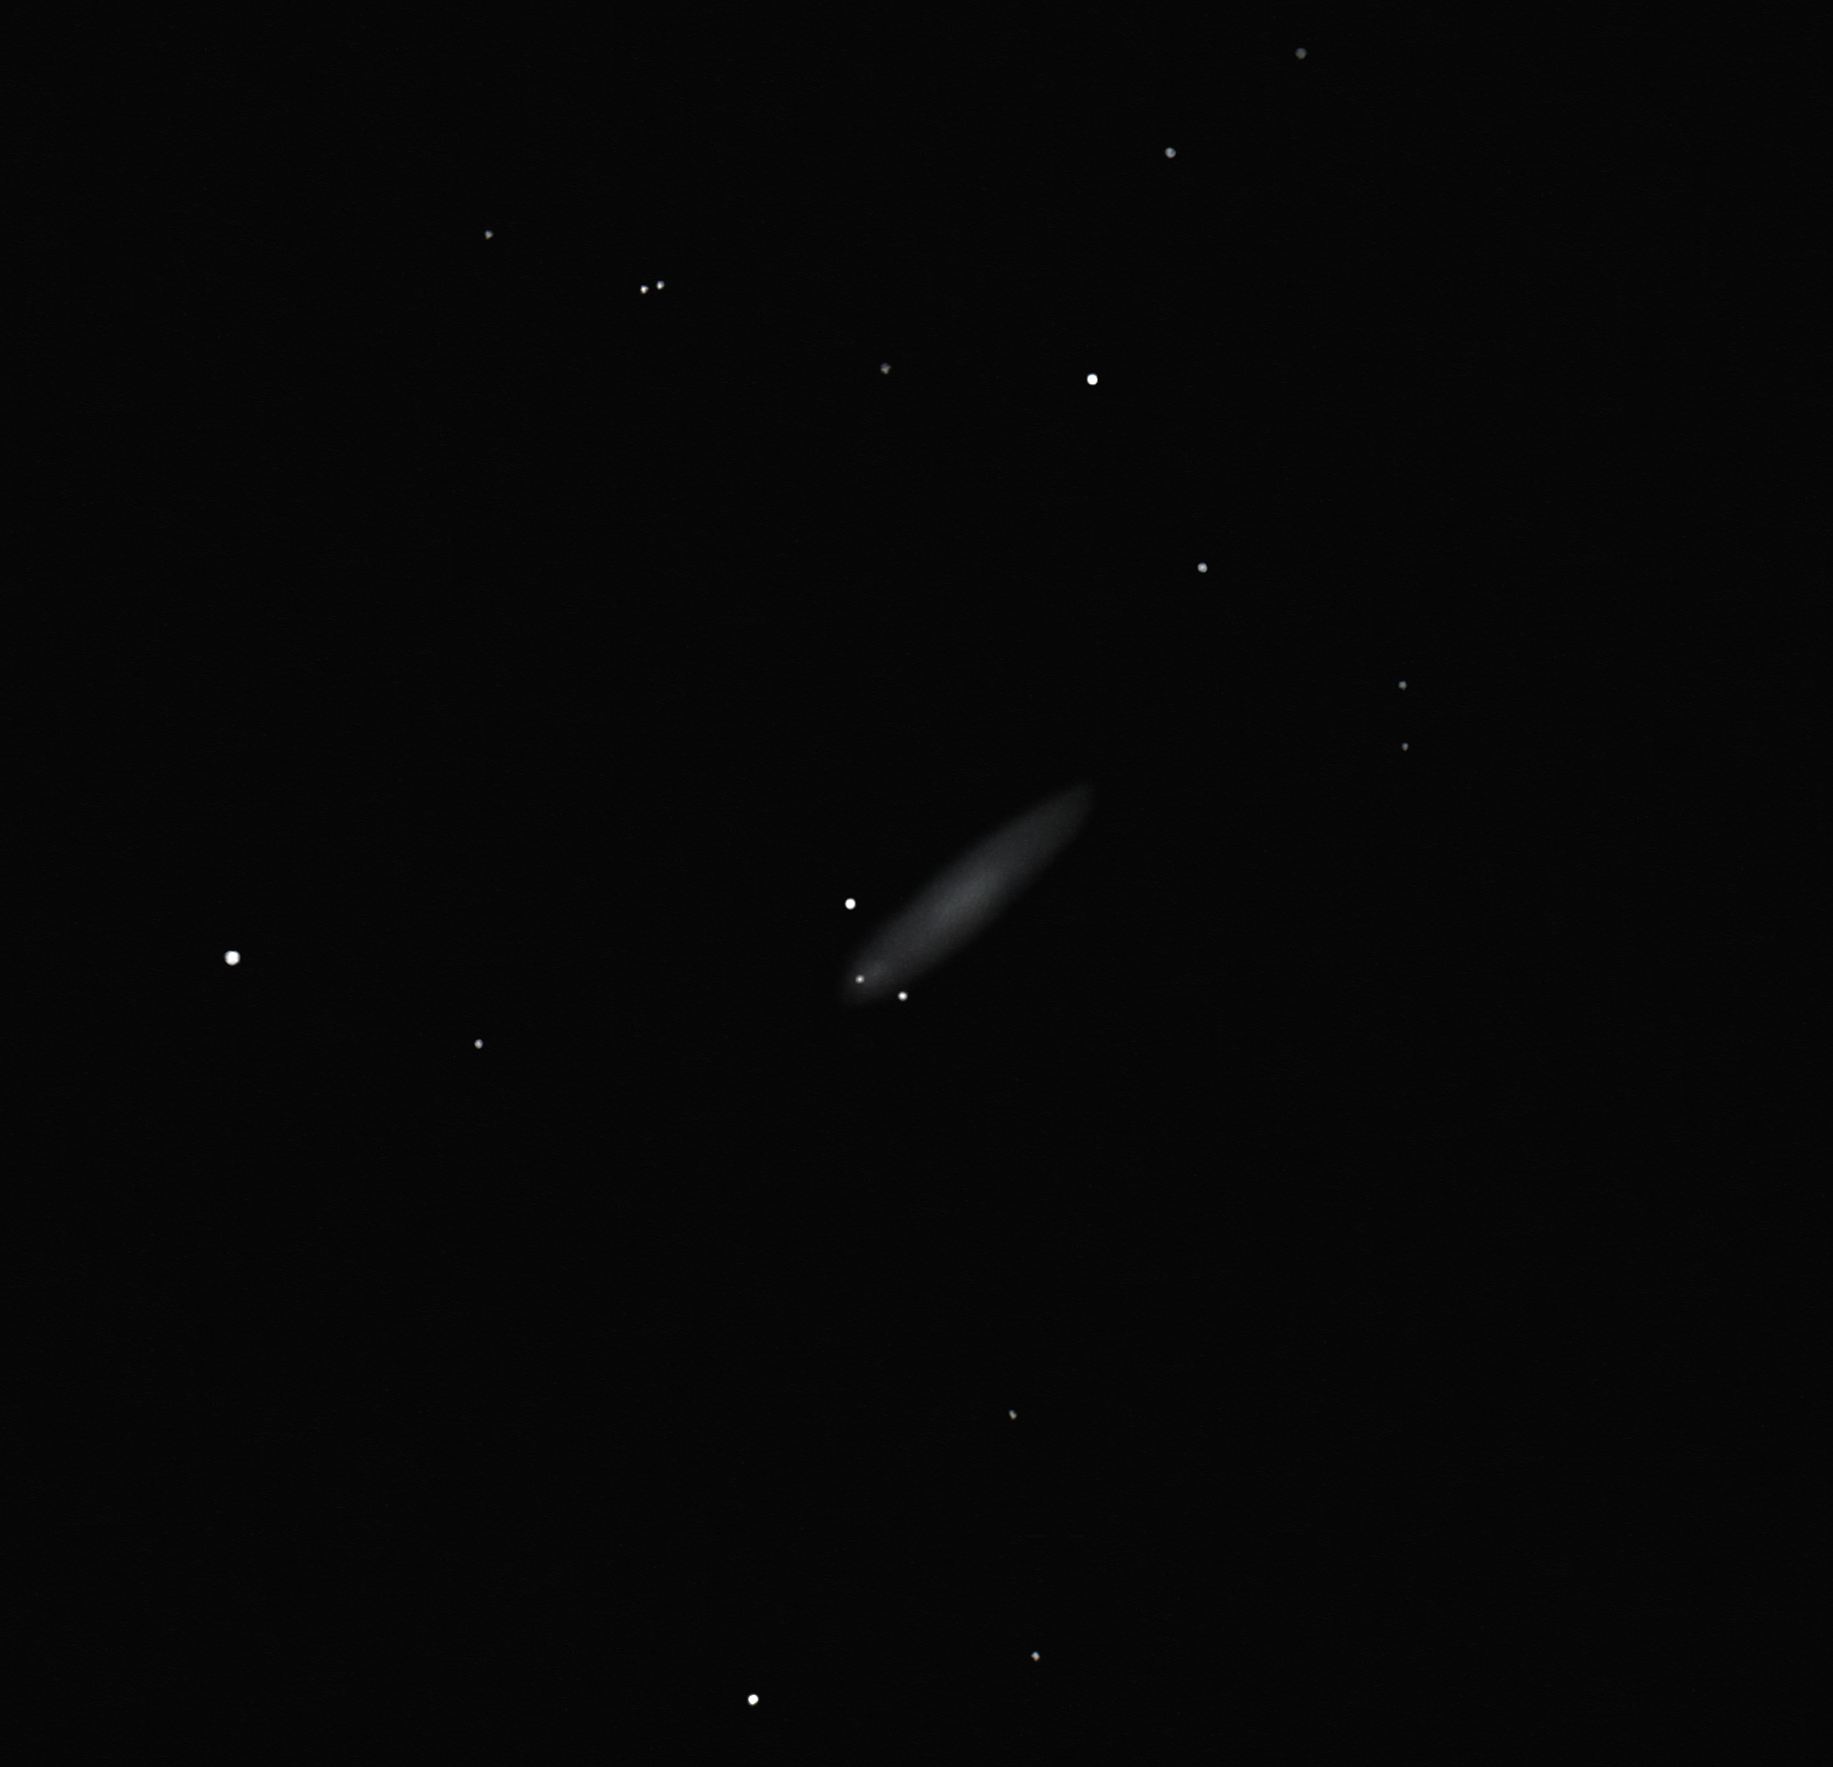 ngc 4559 galaxy